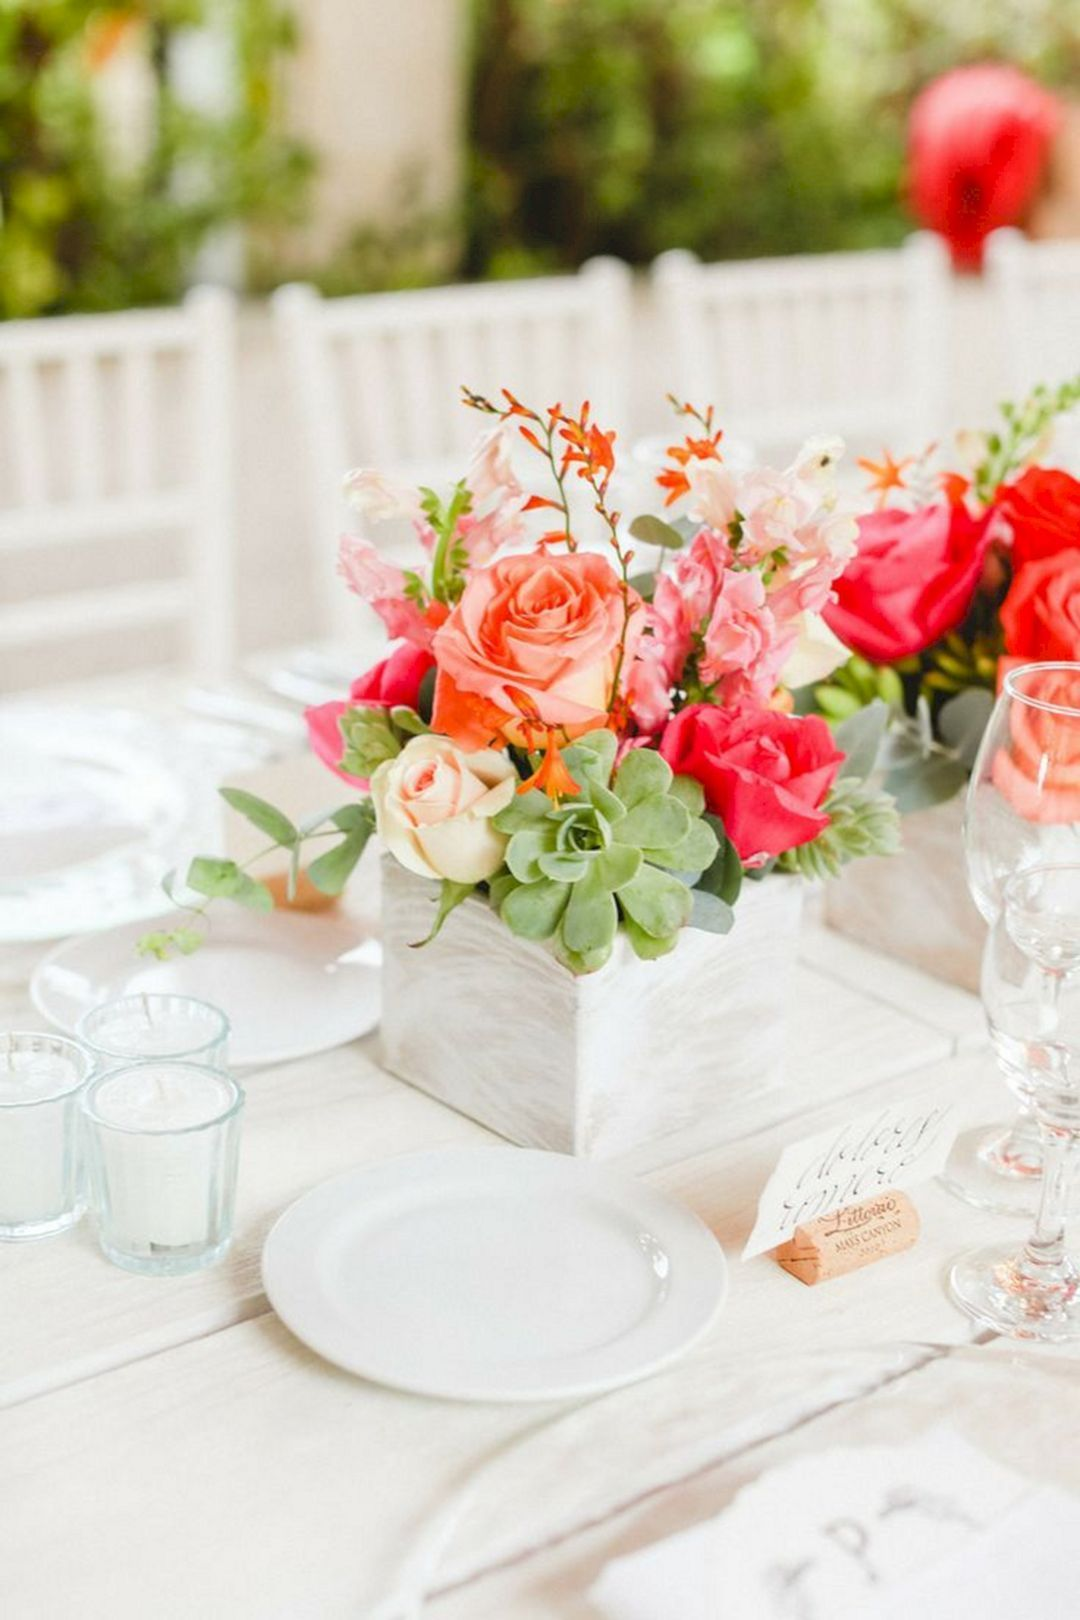 Elegant 25+ Summer Wedding Centerpieces Ideas On a Budget | Summer ...